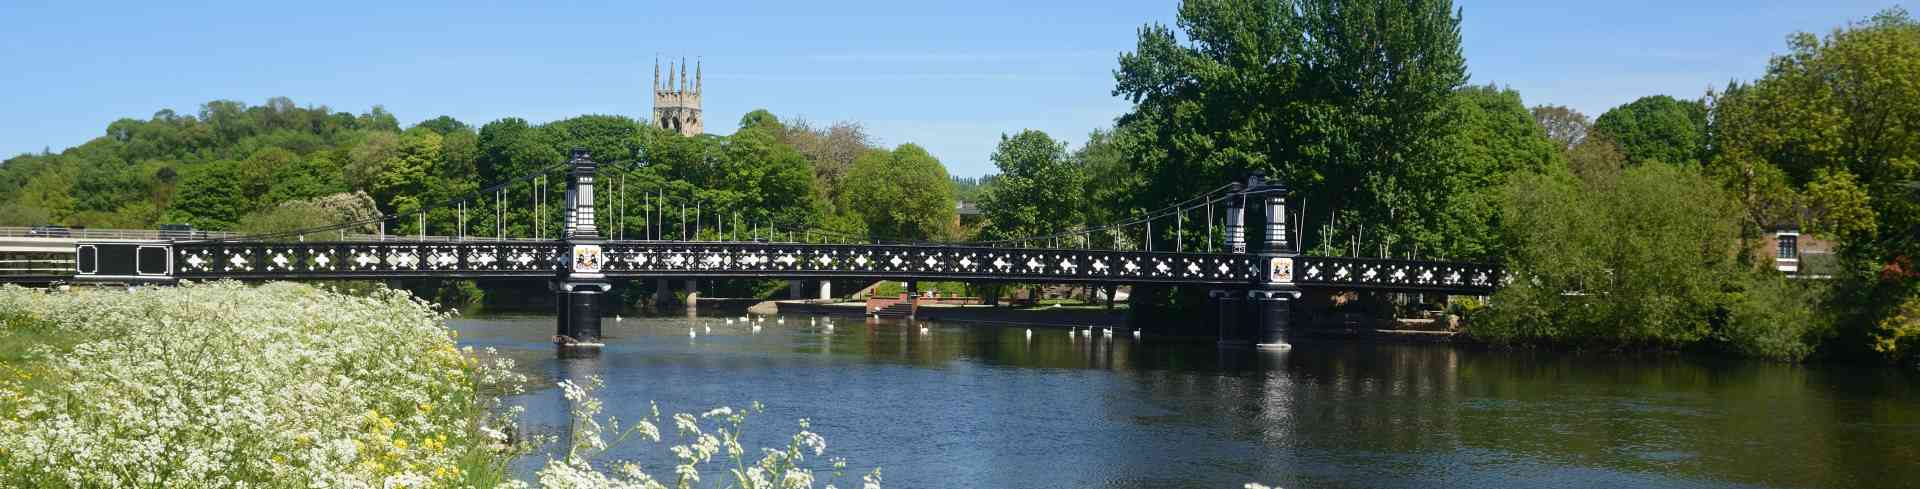 Burton Bridge Mortgage Burton on Trent